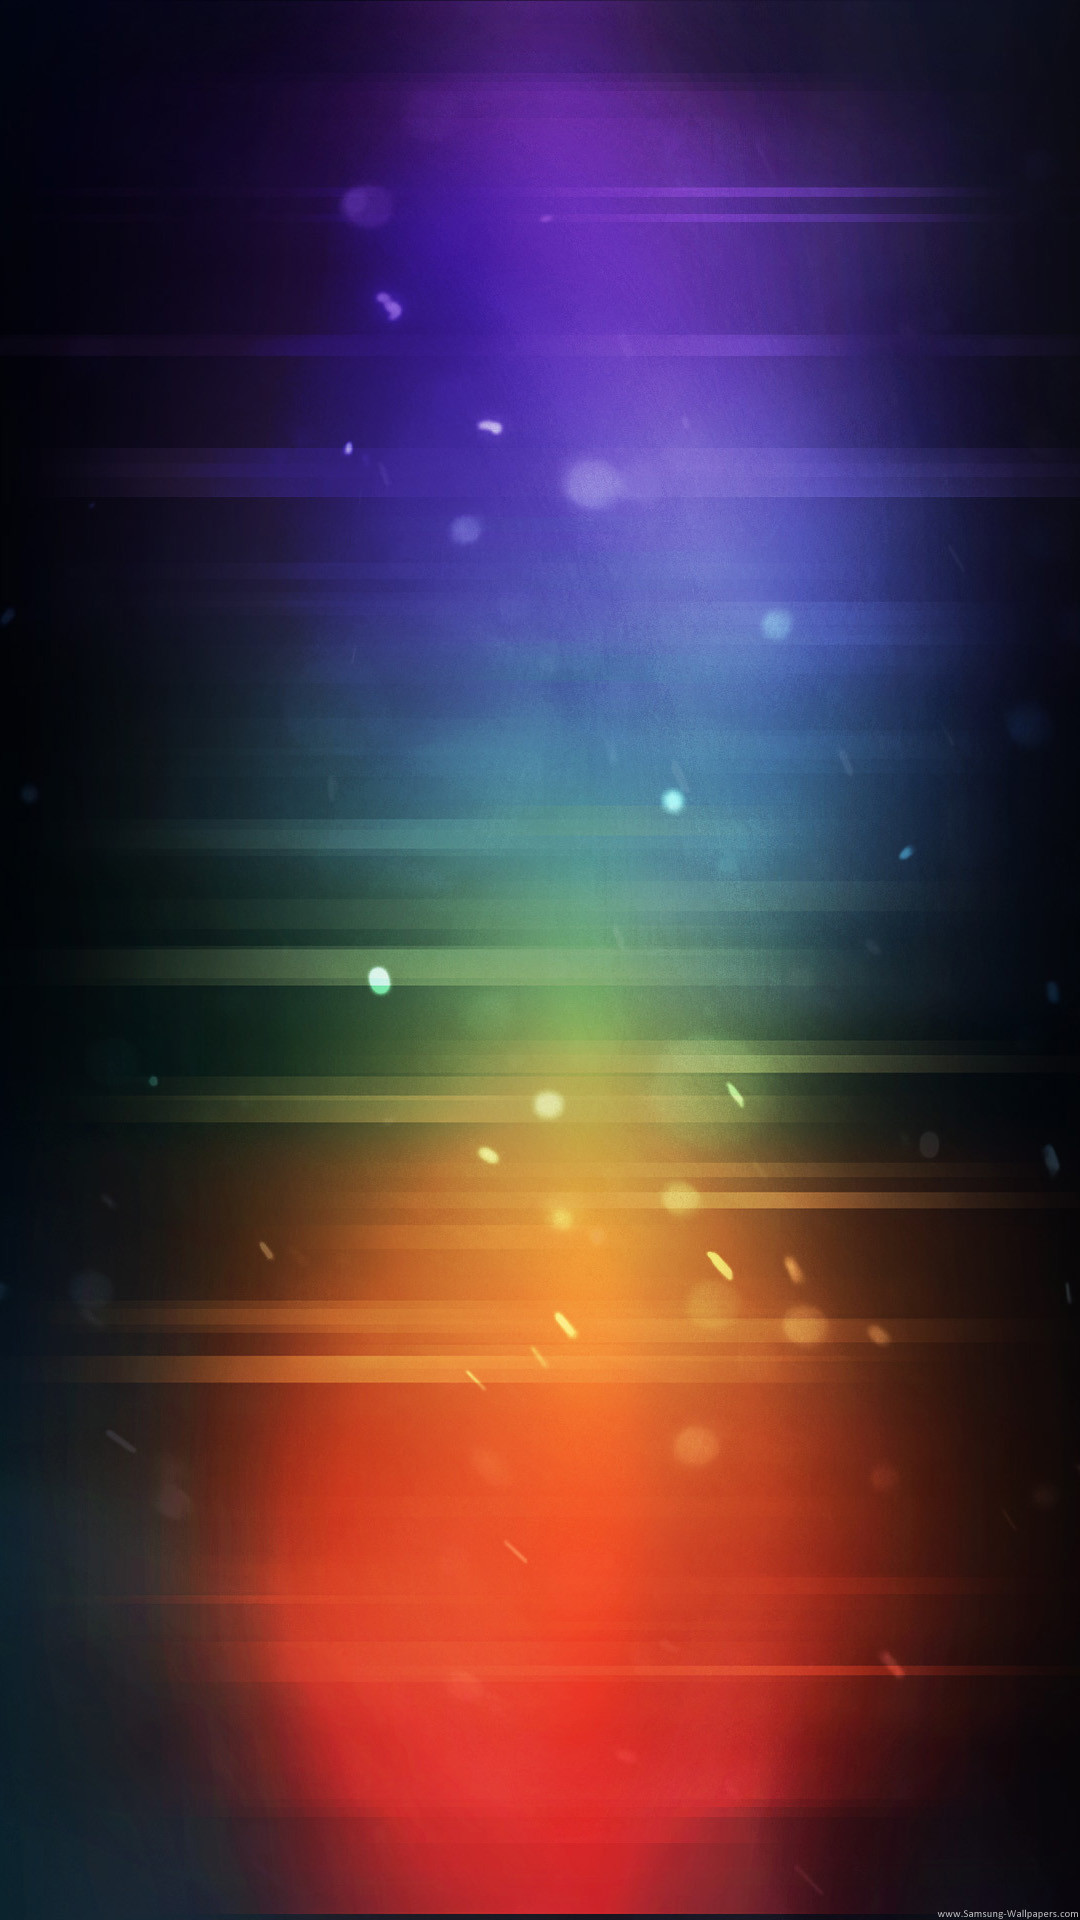 1920x1080 Wallpaperwiki Nexus 7 Wallpaper Picture PIC WPE002365 Download